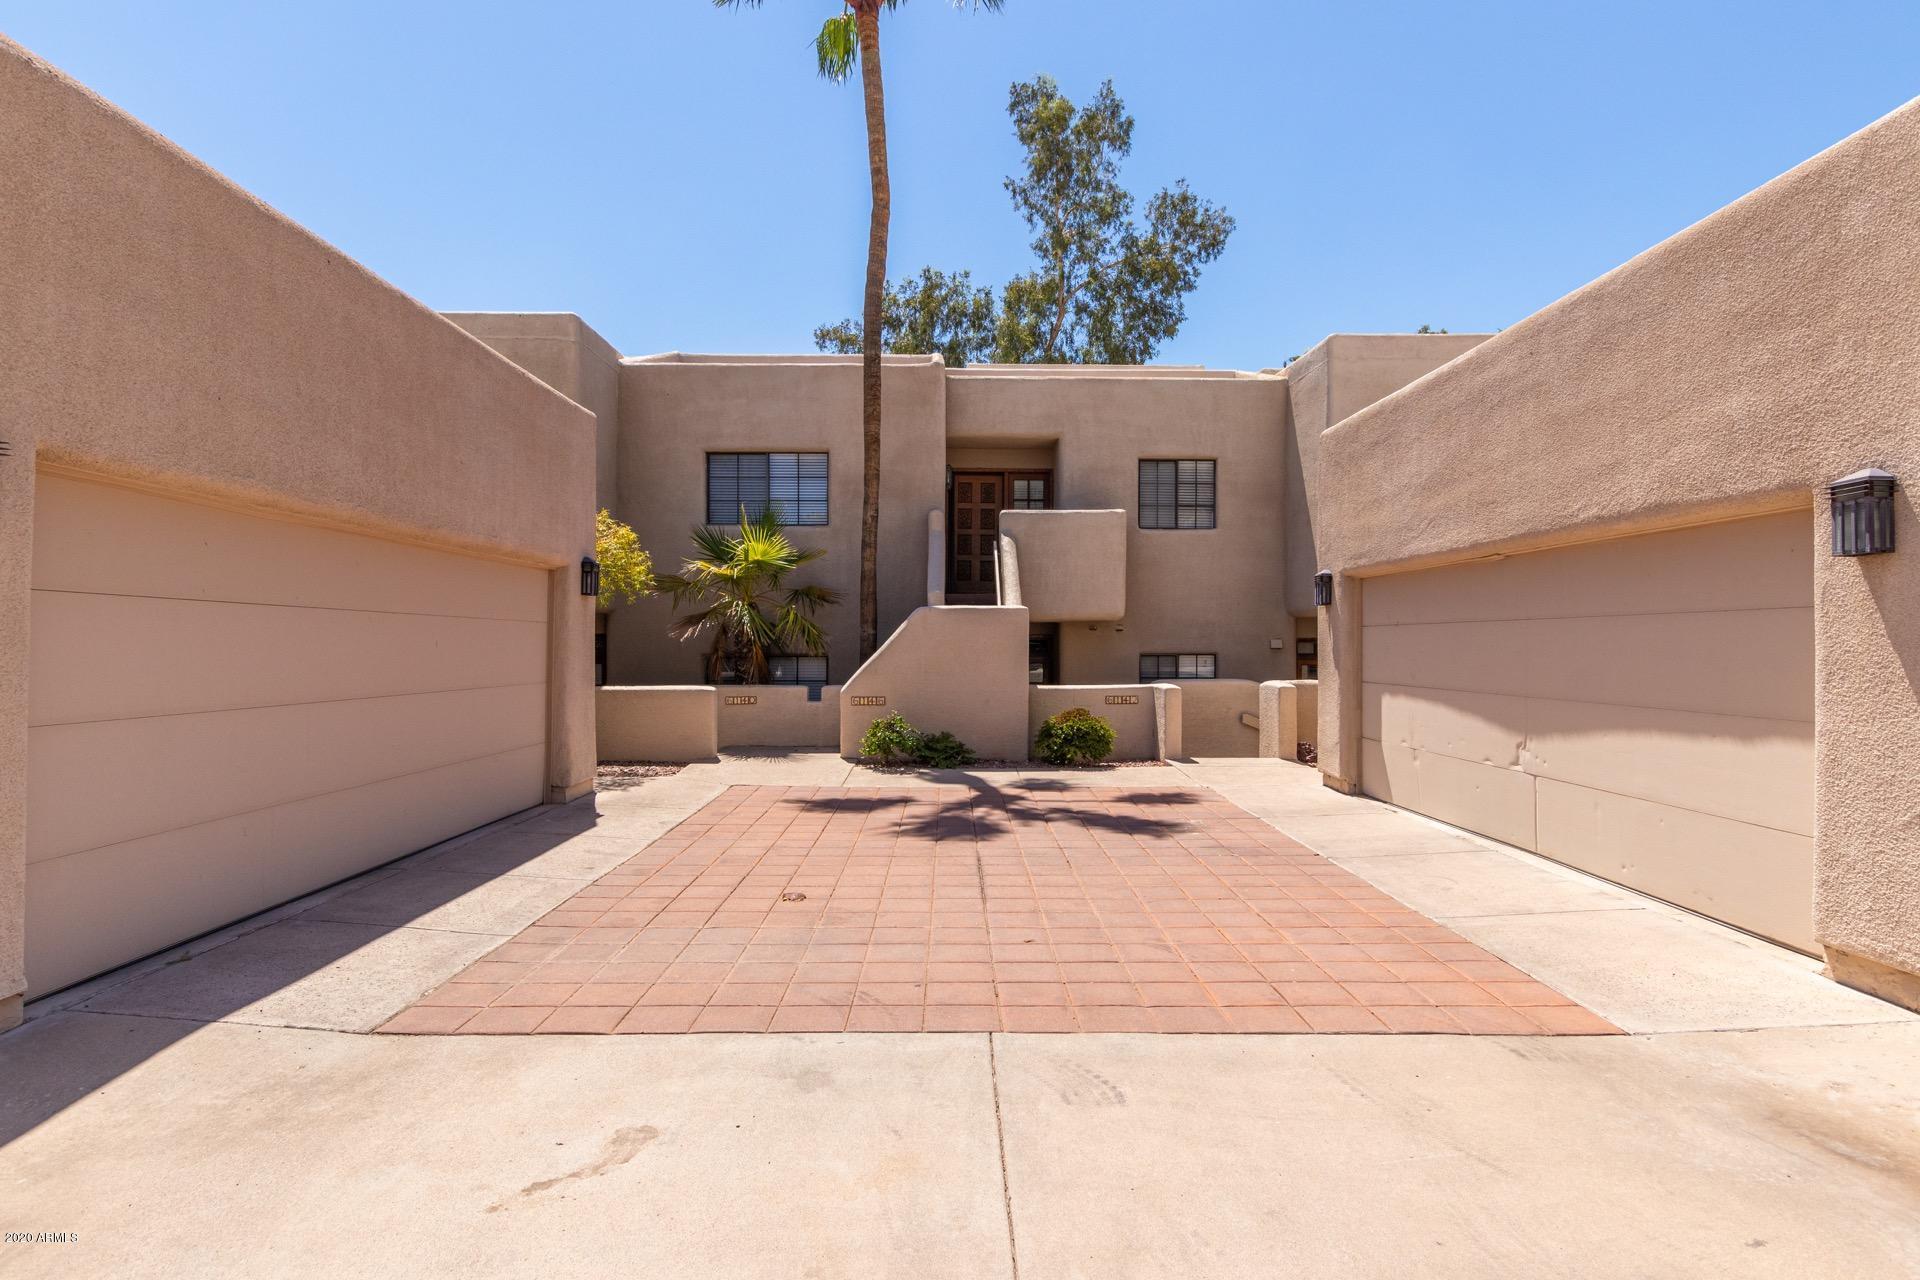 MLS 6115901 Phoenix Metro Area, Phoenix, AZ 85016 Waterfront Homes in Phoenix